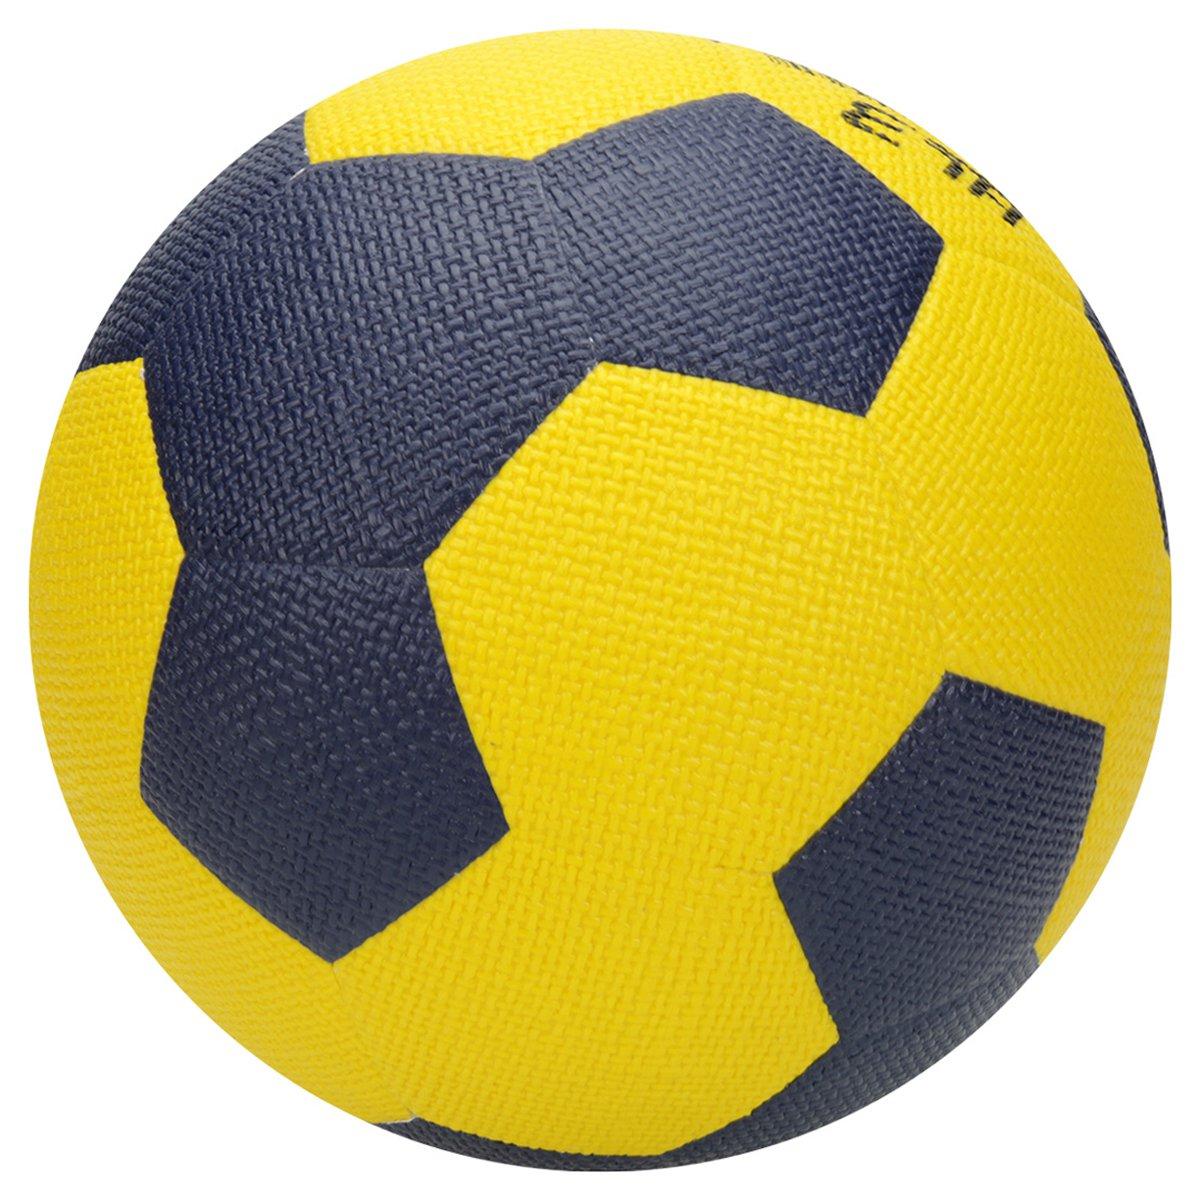 Bola Dalponte Handebol MTR Masculina H3 - Compre Agora  1ec4fd4f0c14c